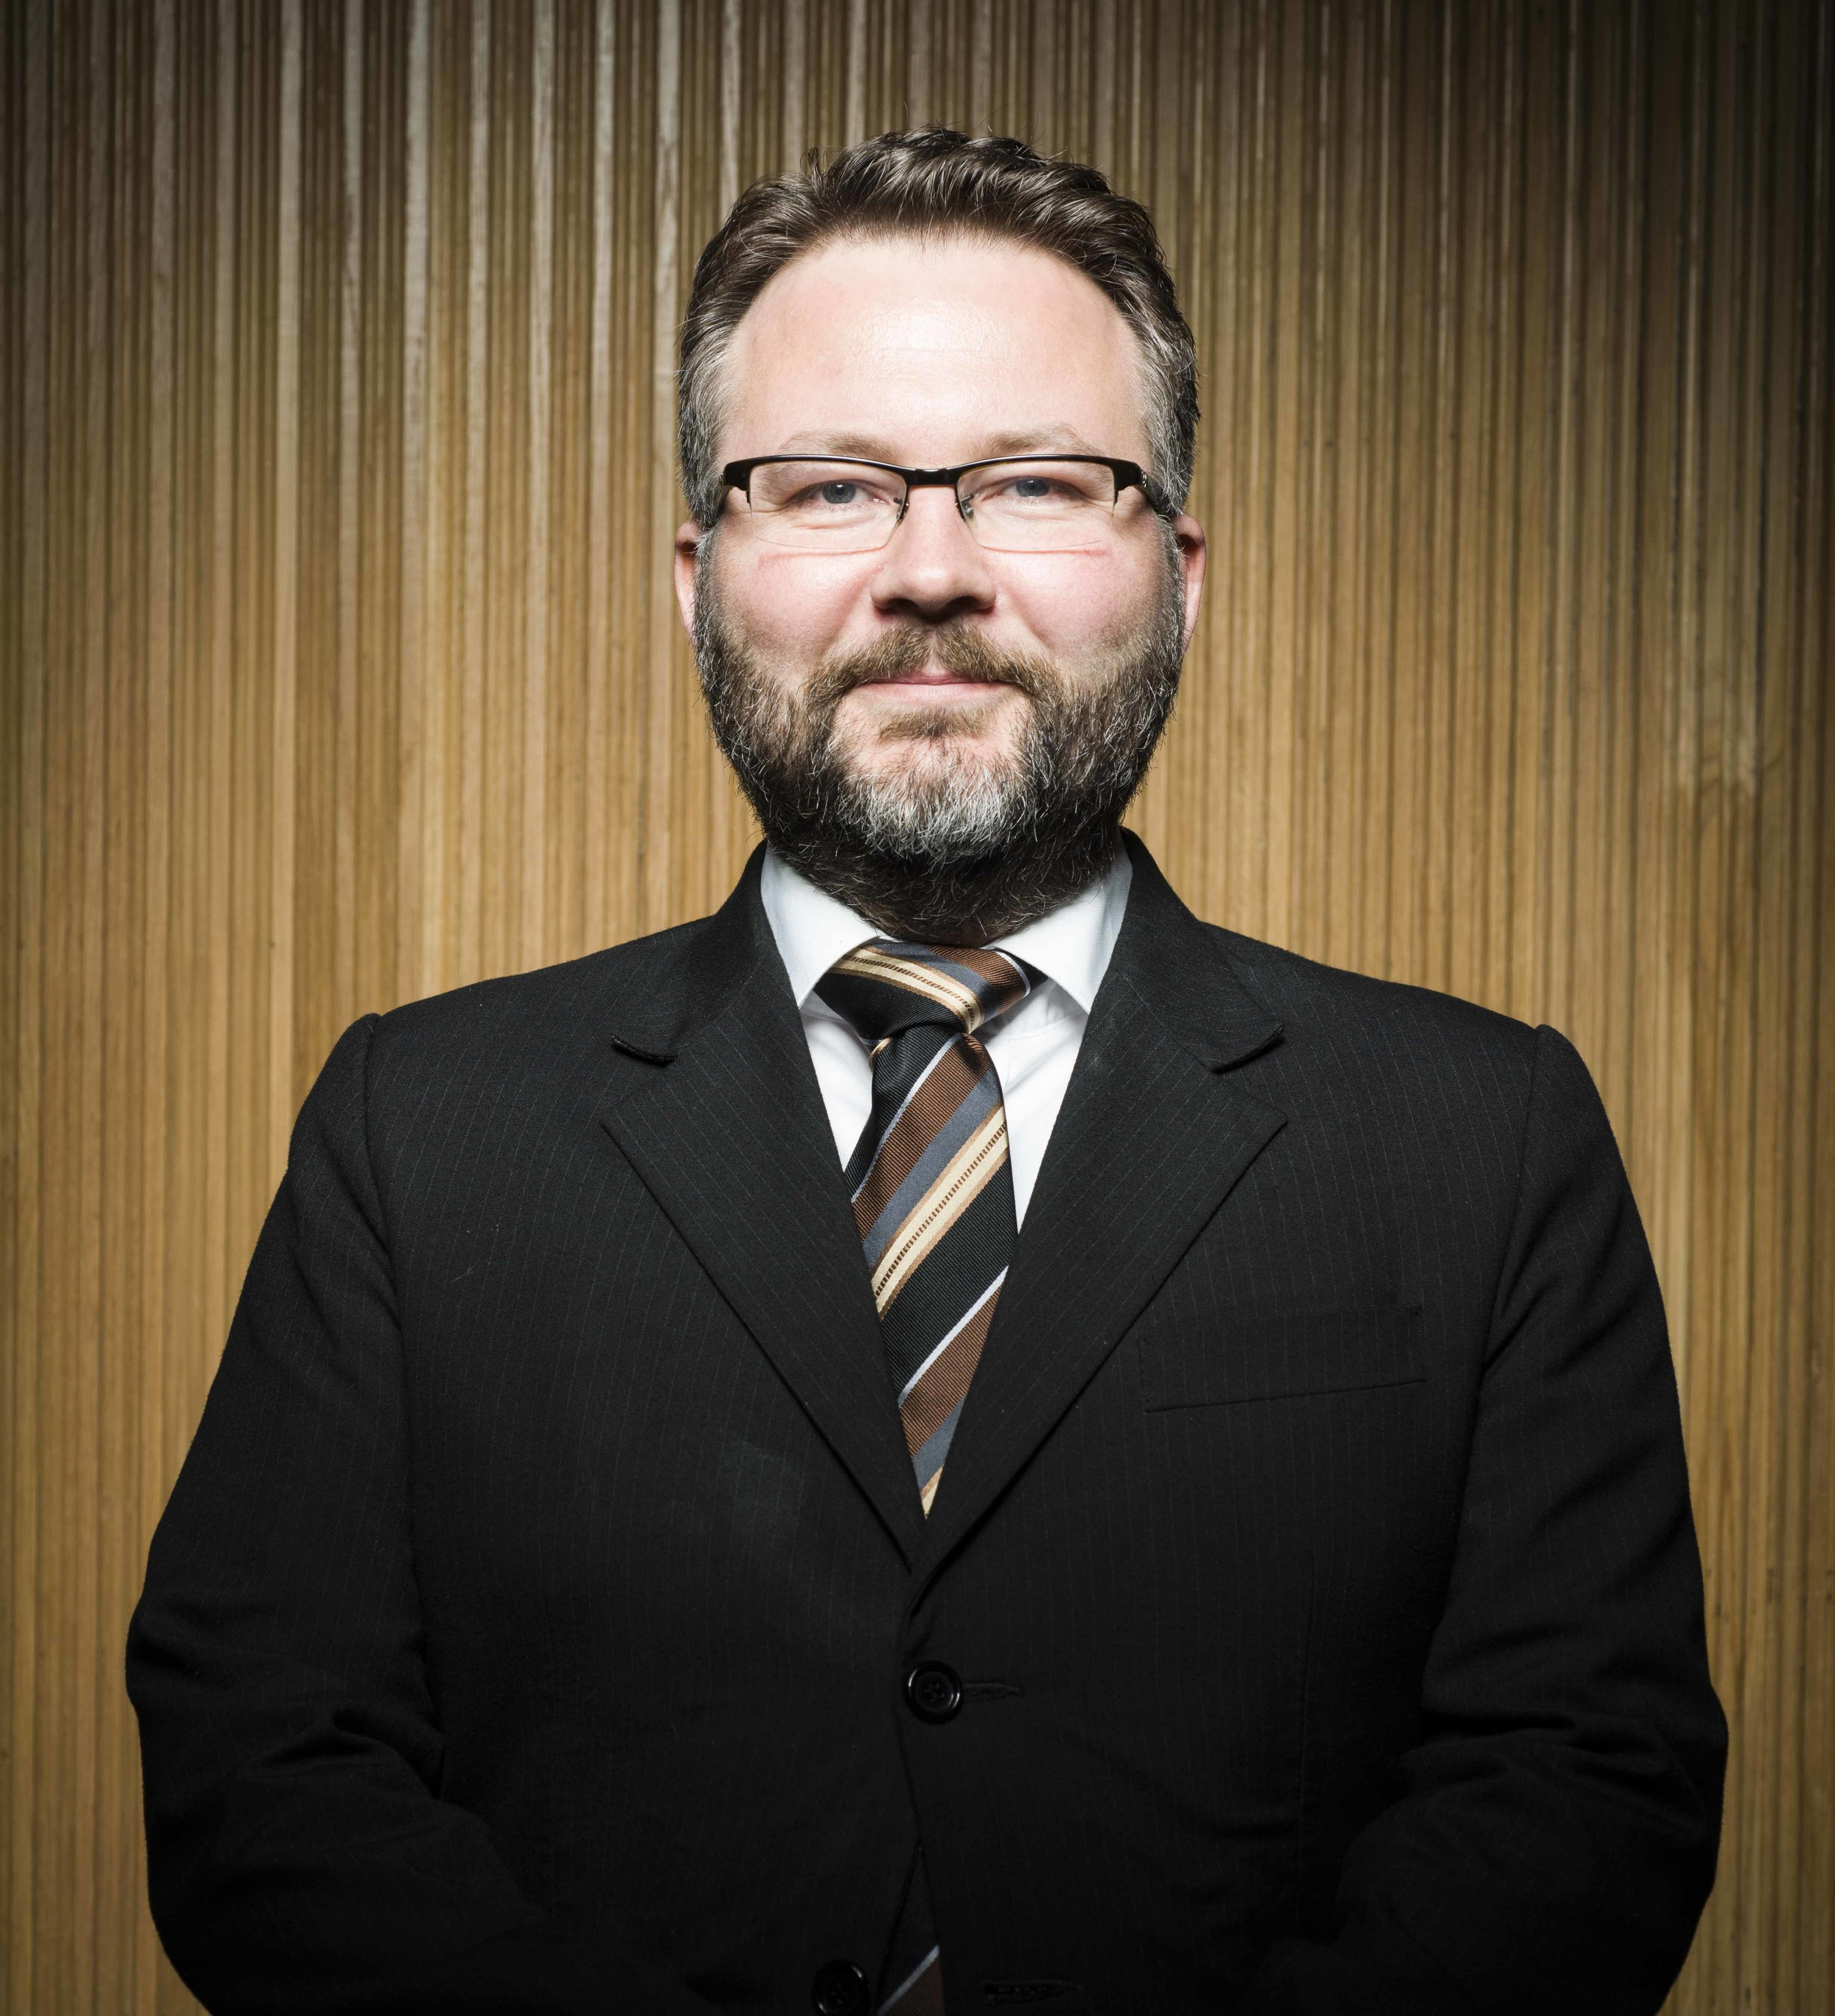 Trond Madsen – Percussion 1 - Photo: Thor Brødreskift